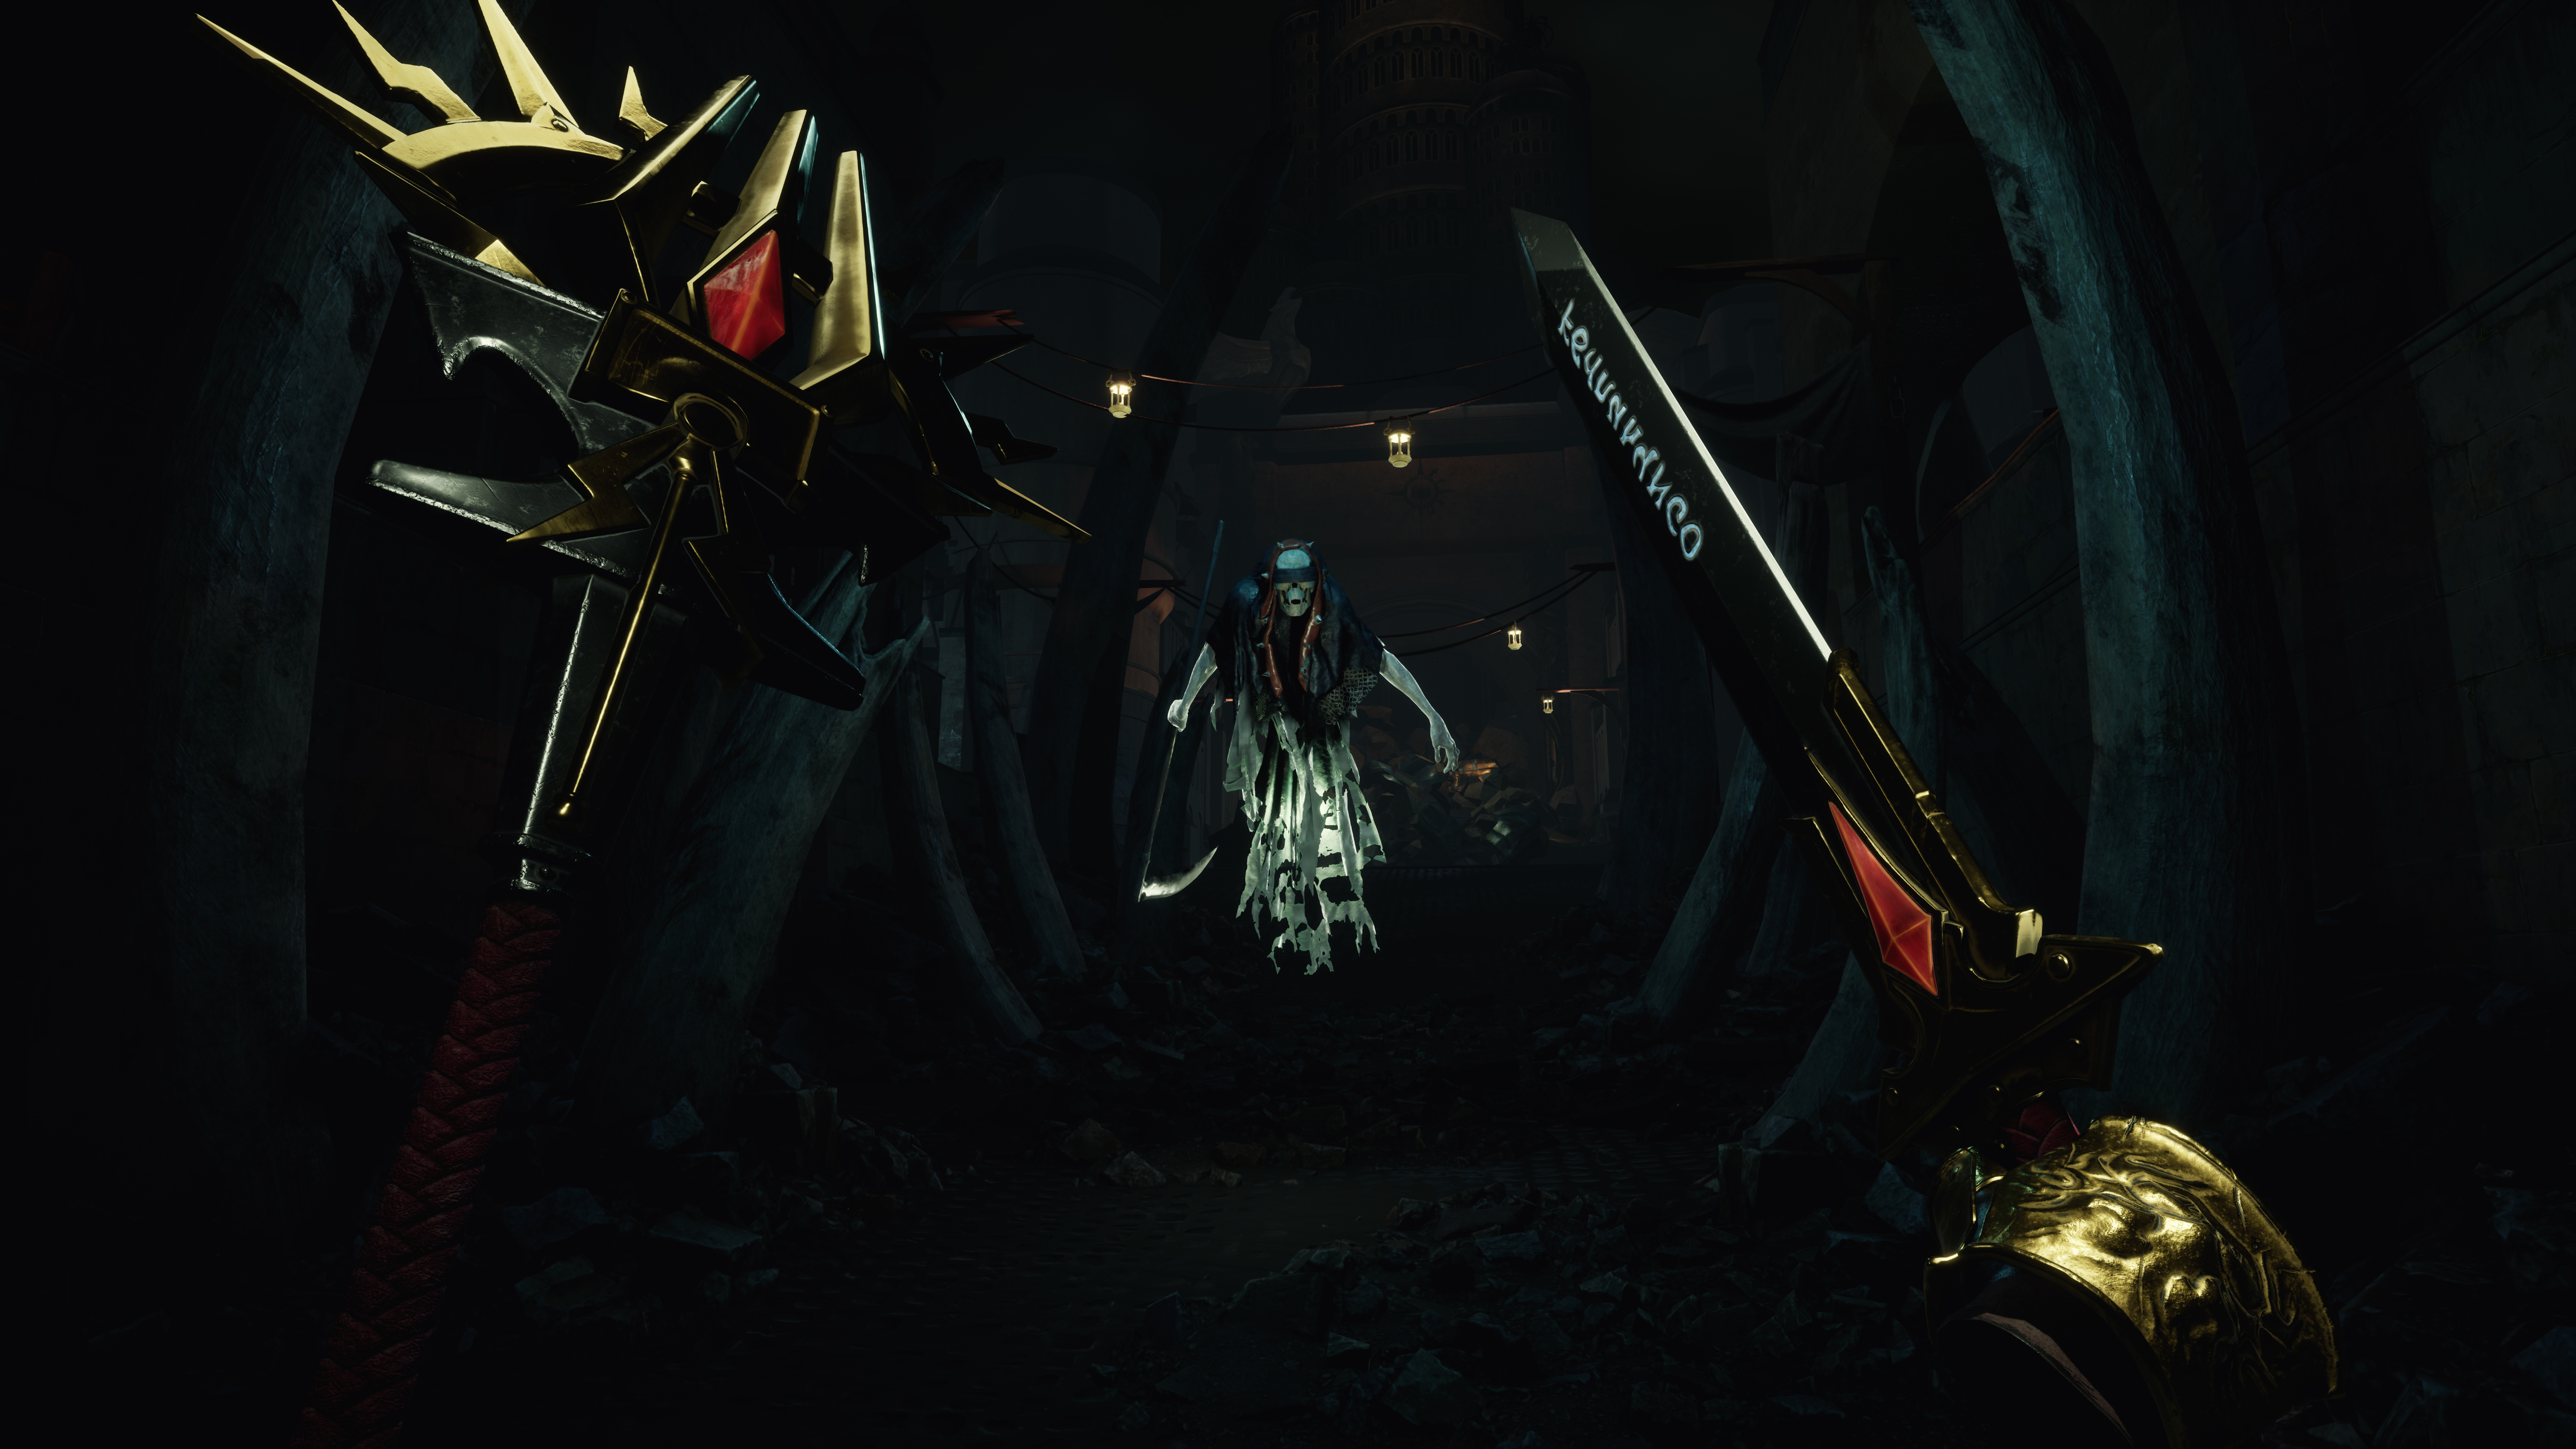 Warhammer-Age-of-Sigmar-Tempestfall_2021_03-25-21_004